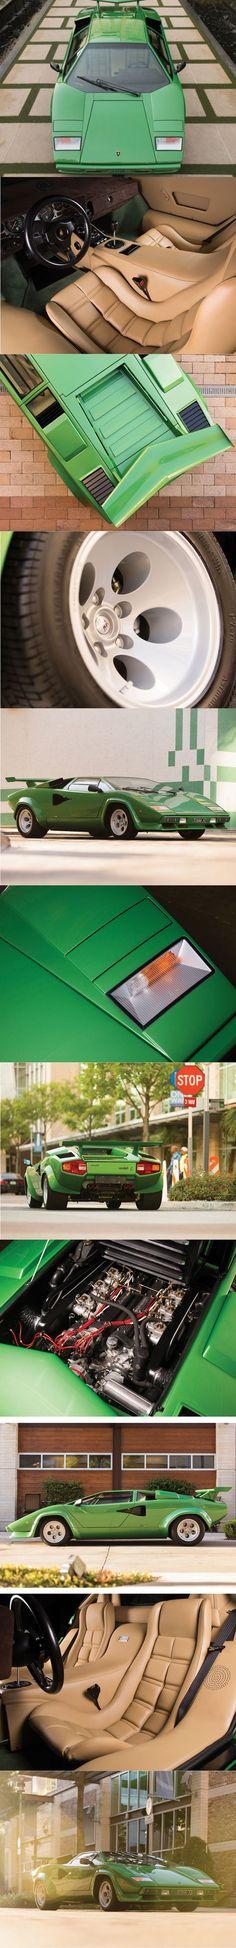 1978 Lamborghini Countach LP400 S / Italy / green / 350 hp / 82… - https://www.luxury.guugles.com/1978-lamborghini-countach-lp400-s-italy-green-350-hp-82/